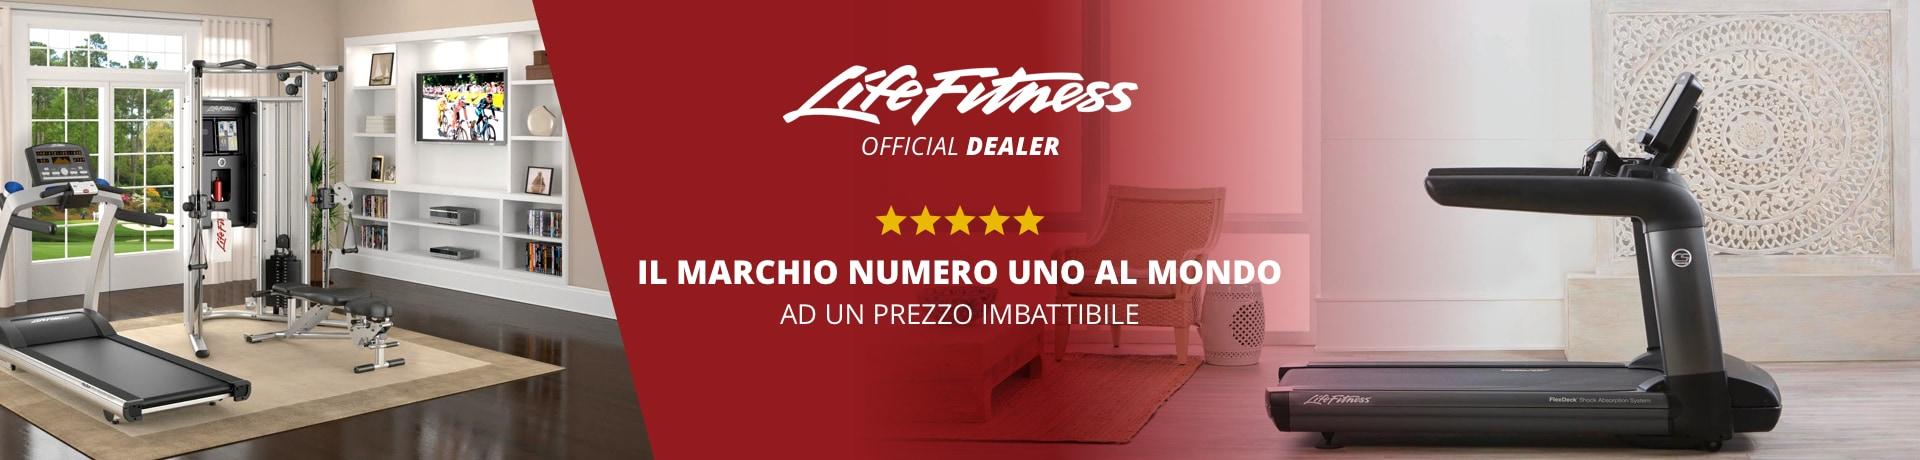 oferta-life-fitness